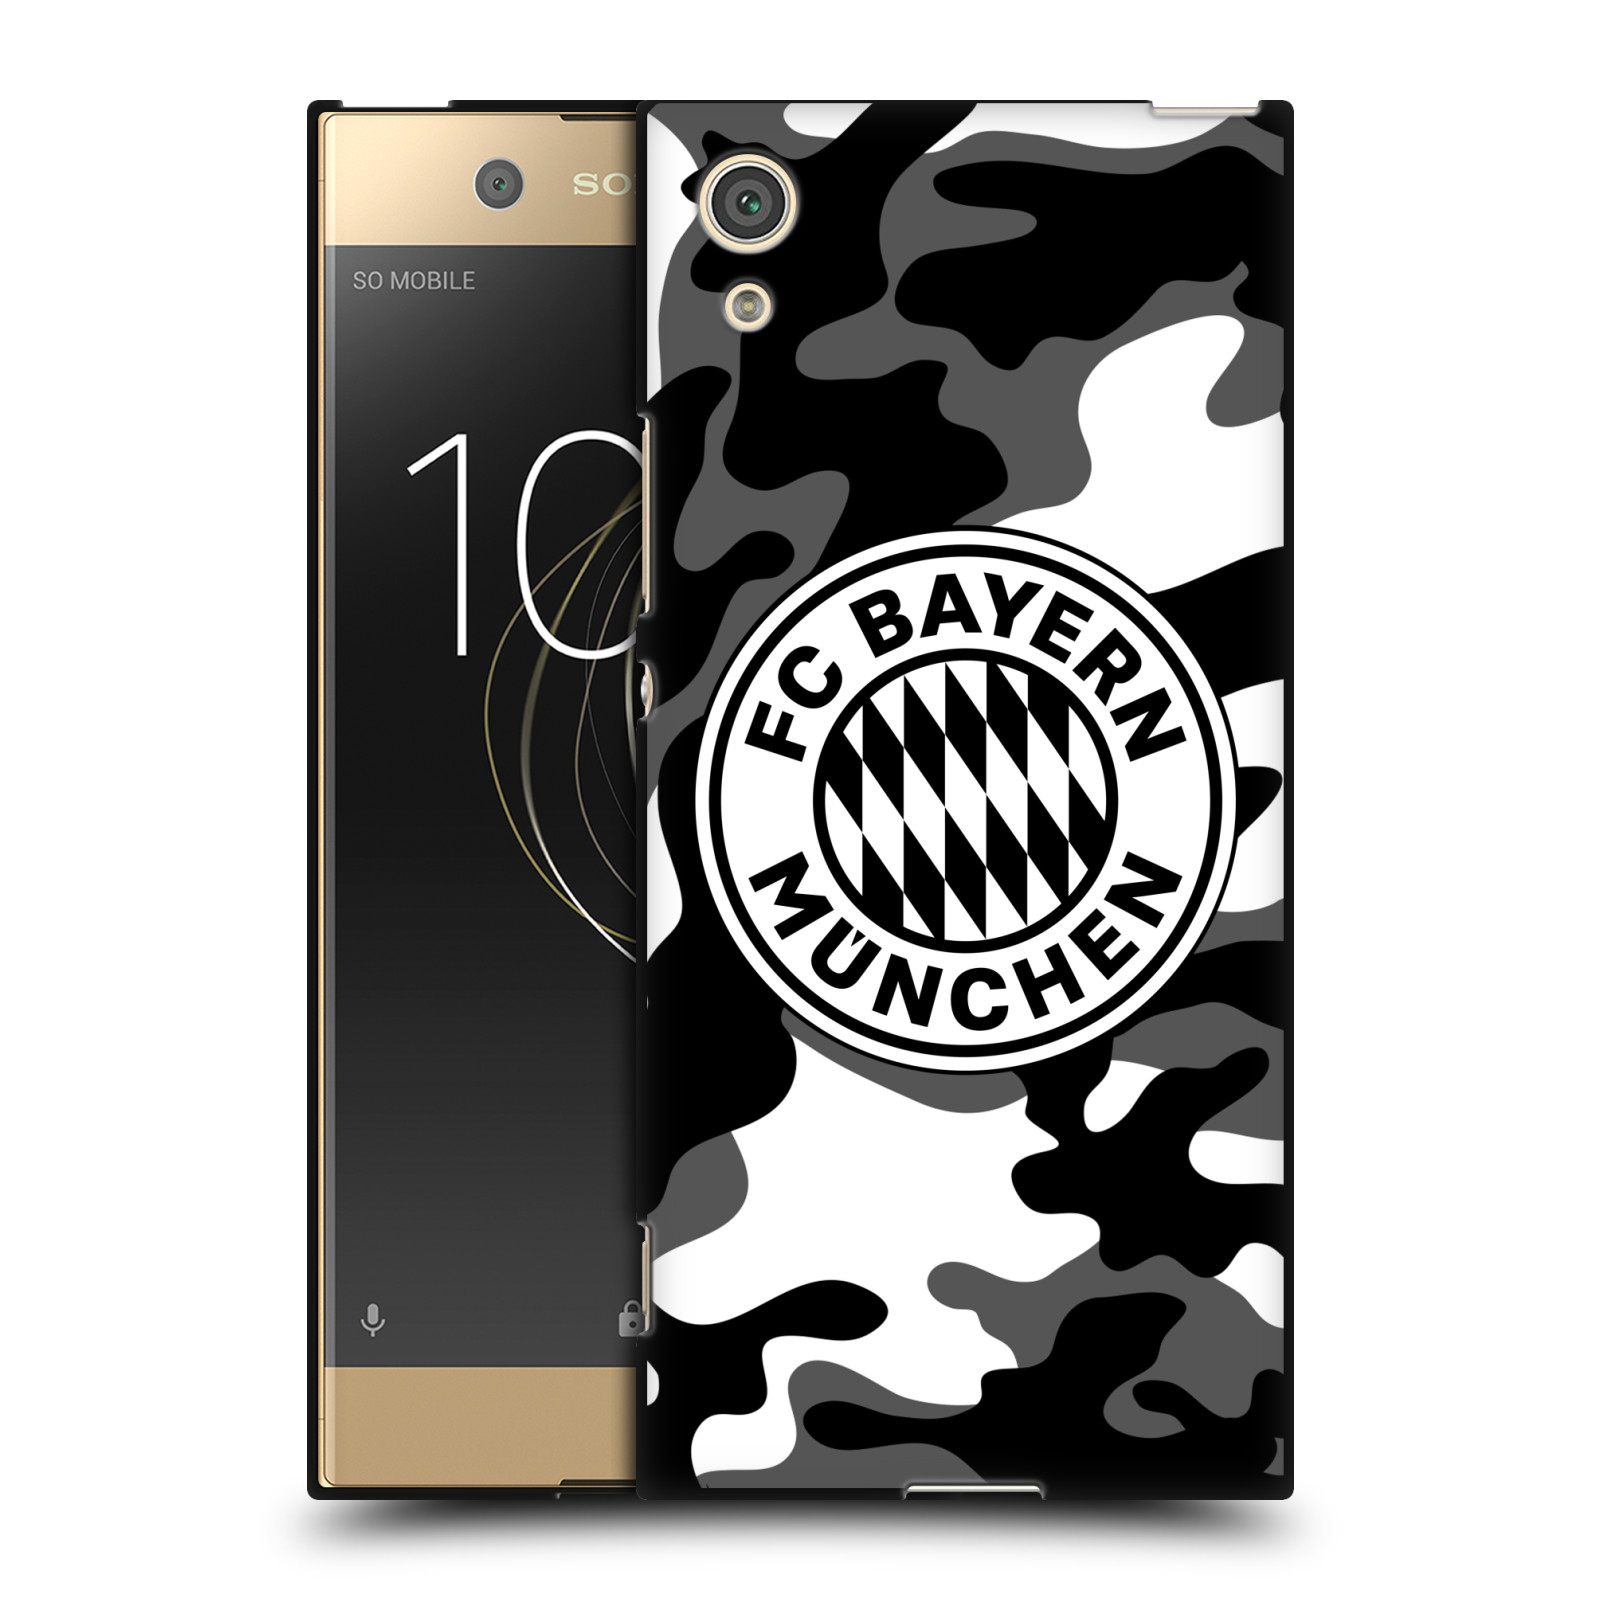 OFFICIAL-FC-BAYERN-MUNICH-2017-18-PATTERNS-BLACK-SOFT-GEL-CASE-FOR-SONY-PHONES